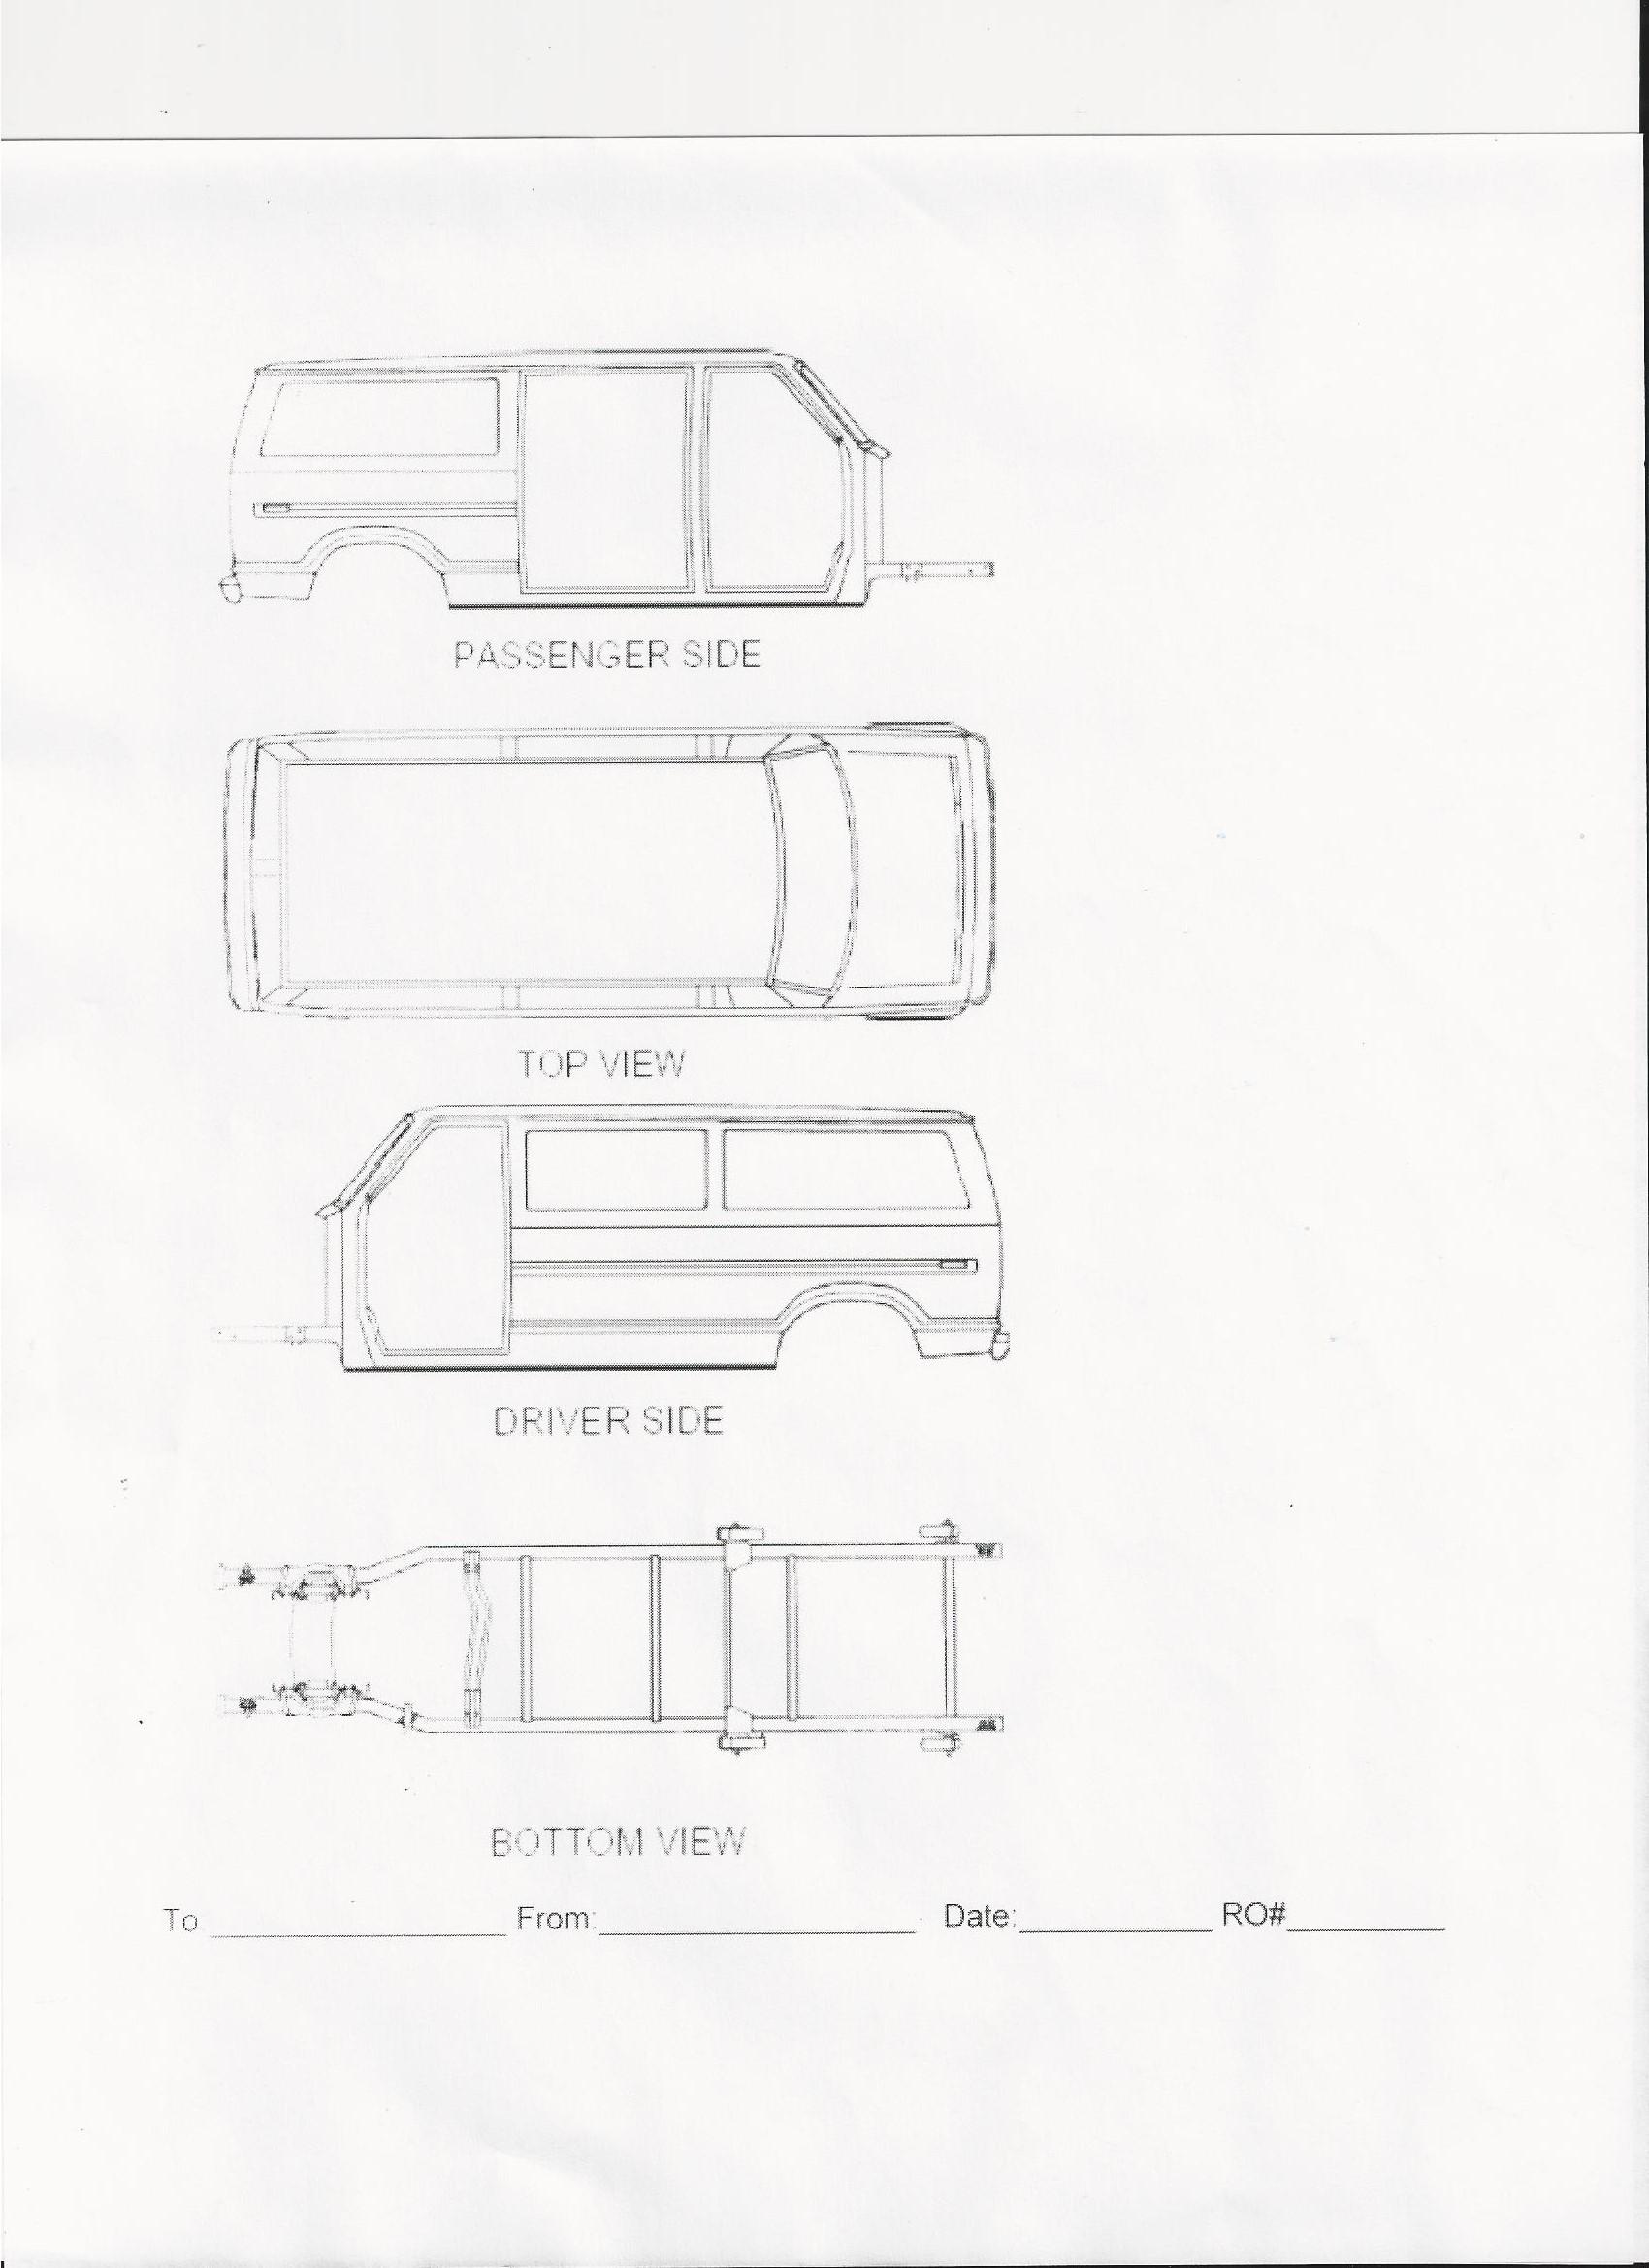 Vehicle Forms - AR1 Auto Wrecking and Sales - Yakima, WA